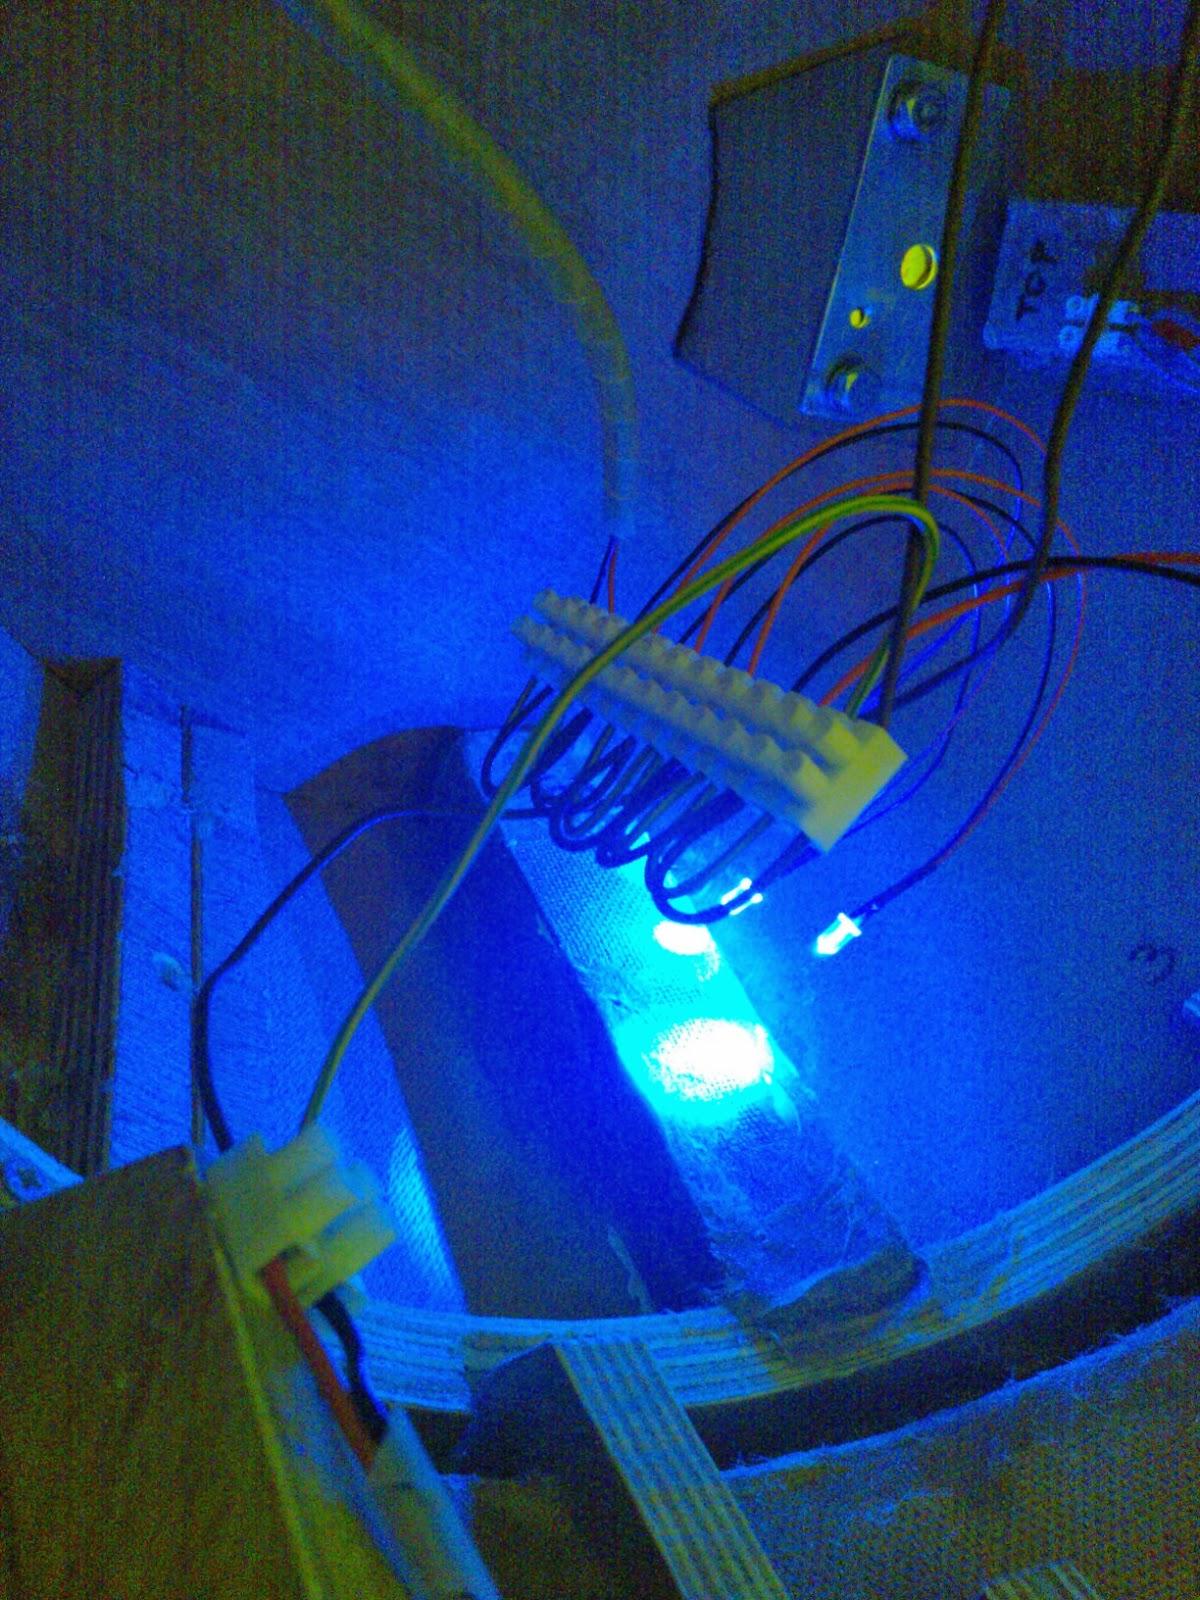 R5-D4 electrics